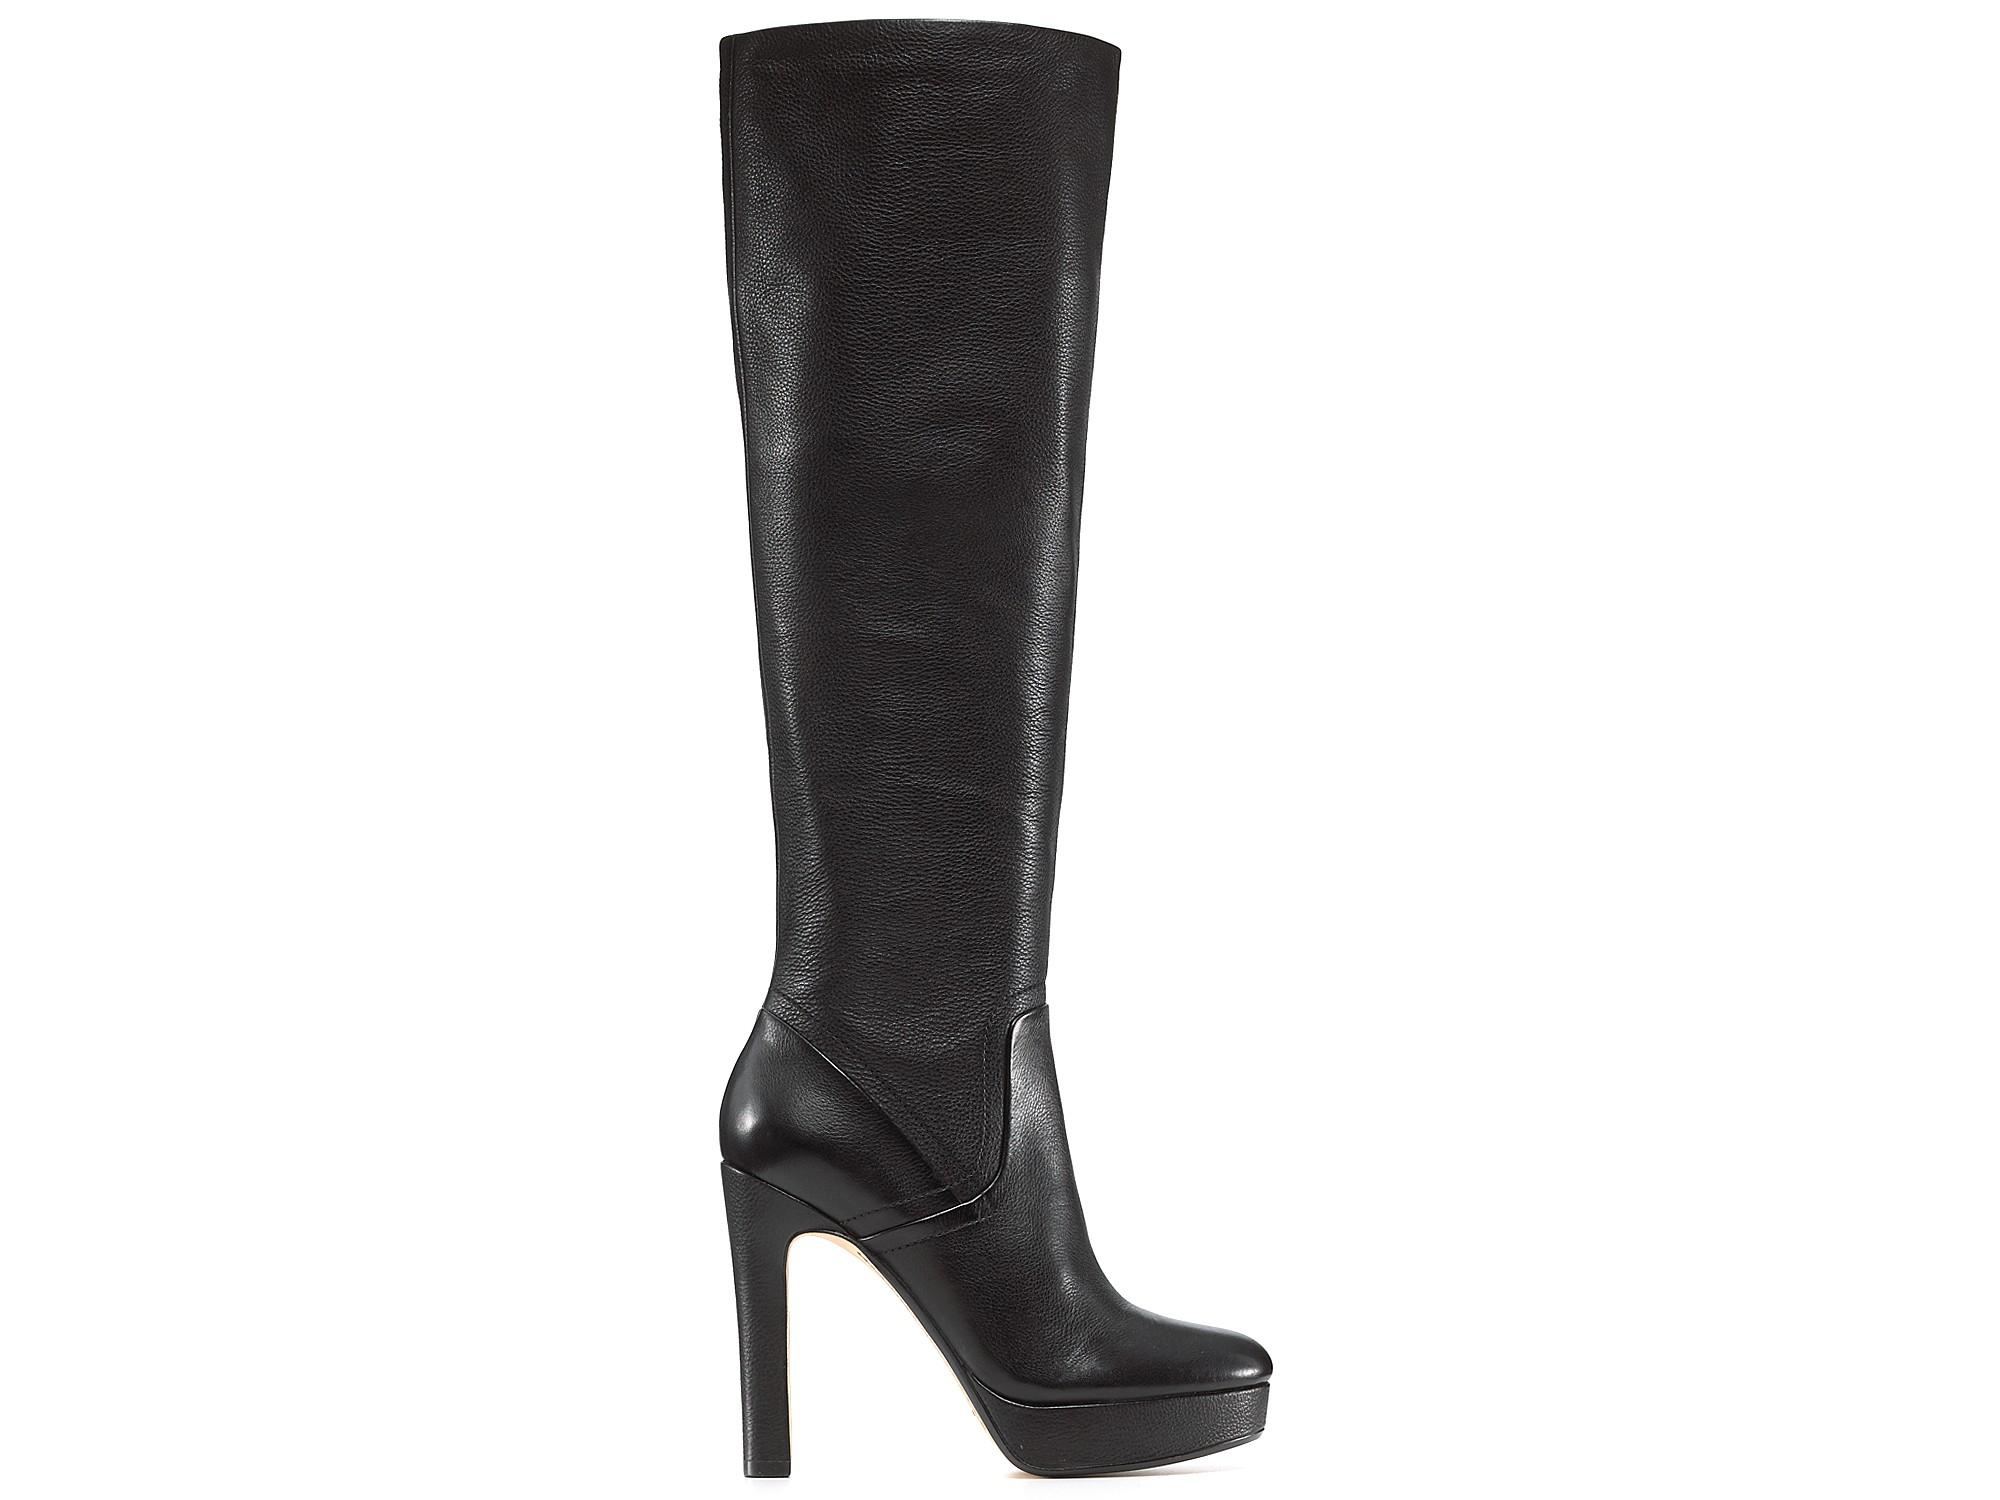 michael kors kors zola high heel boots in black lyst. Black Bedroom Furniture Sets. Home Design Ideas